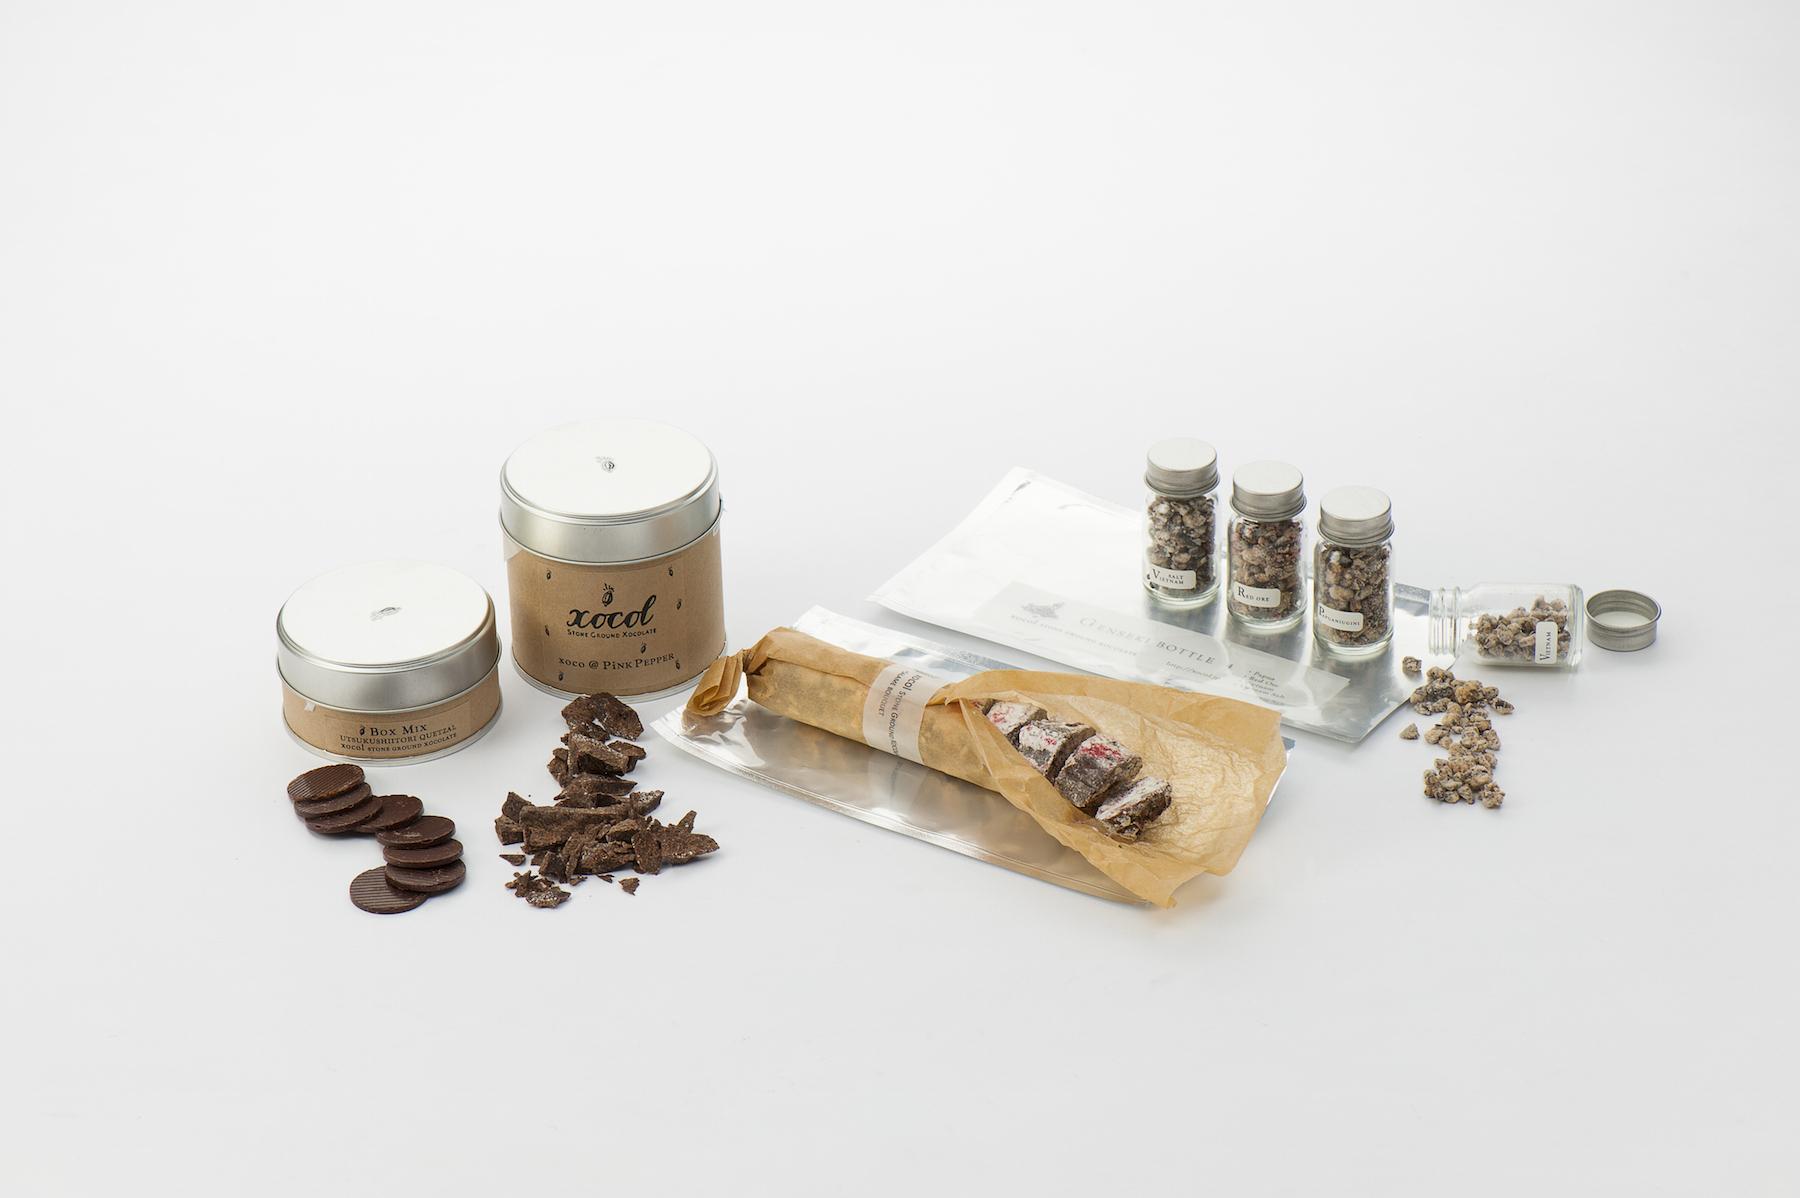 「xocol」(深沢) SALAME BOUQUET 1,250円(税込)、 美しい鳥 QUETZAL BOX MIX 2,130円(税込) など http://